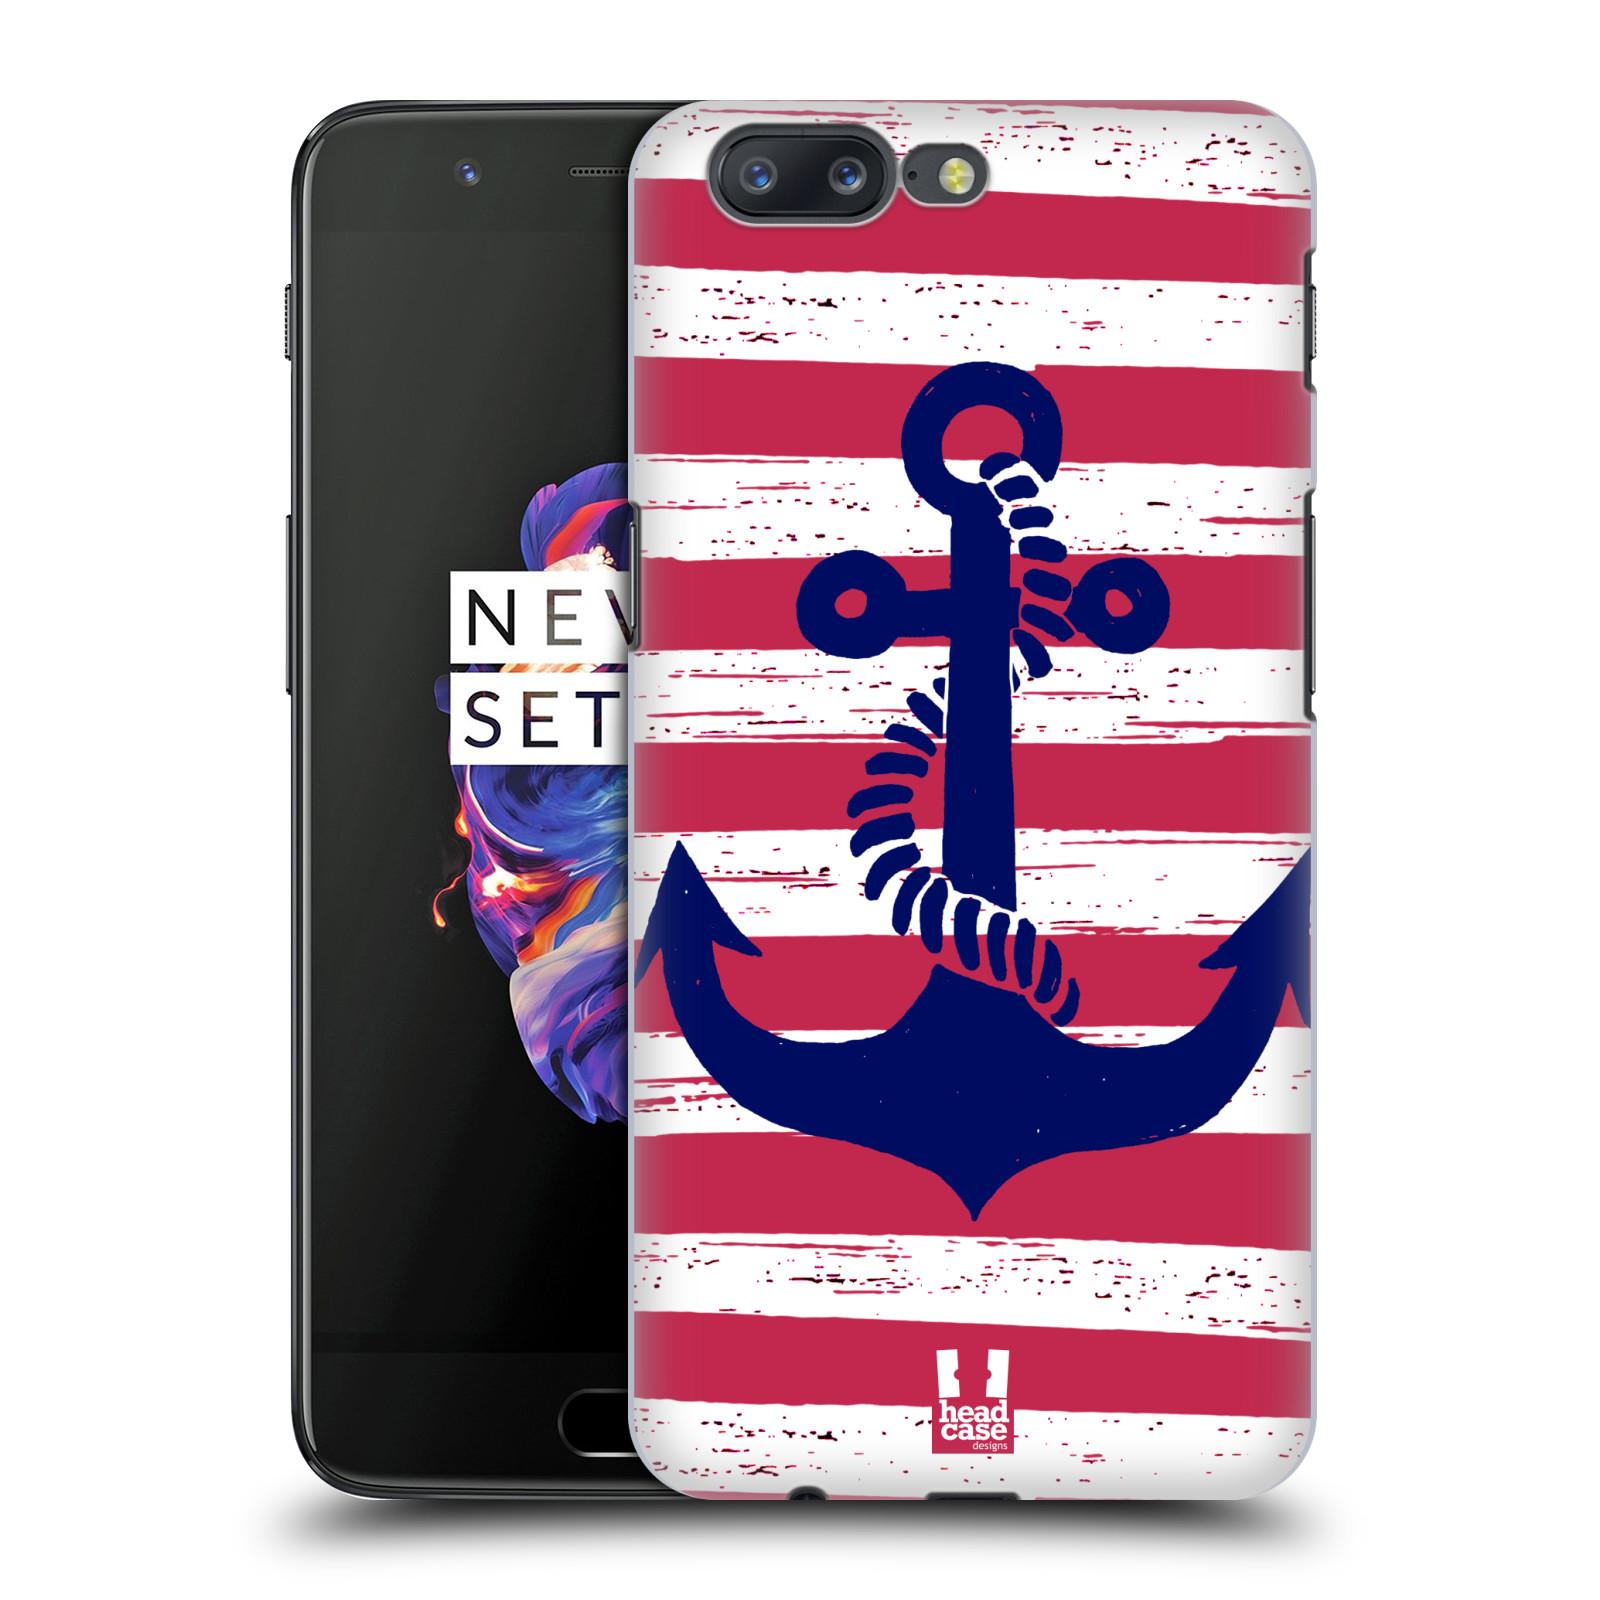 Plastové pouzdro na mobil OnePlus 5 - Head Case - KOTVA S PRUHY